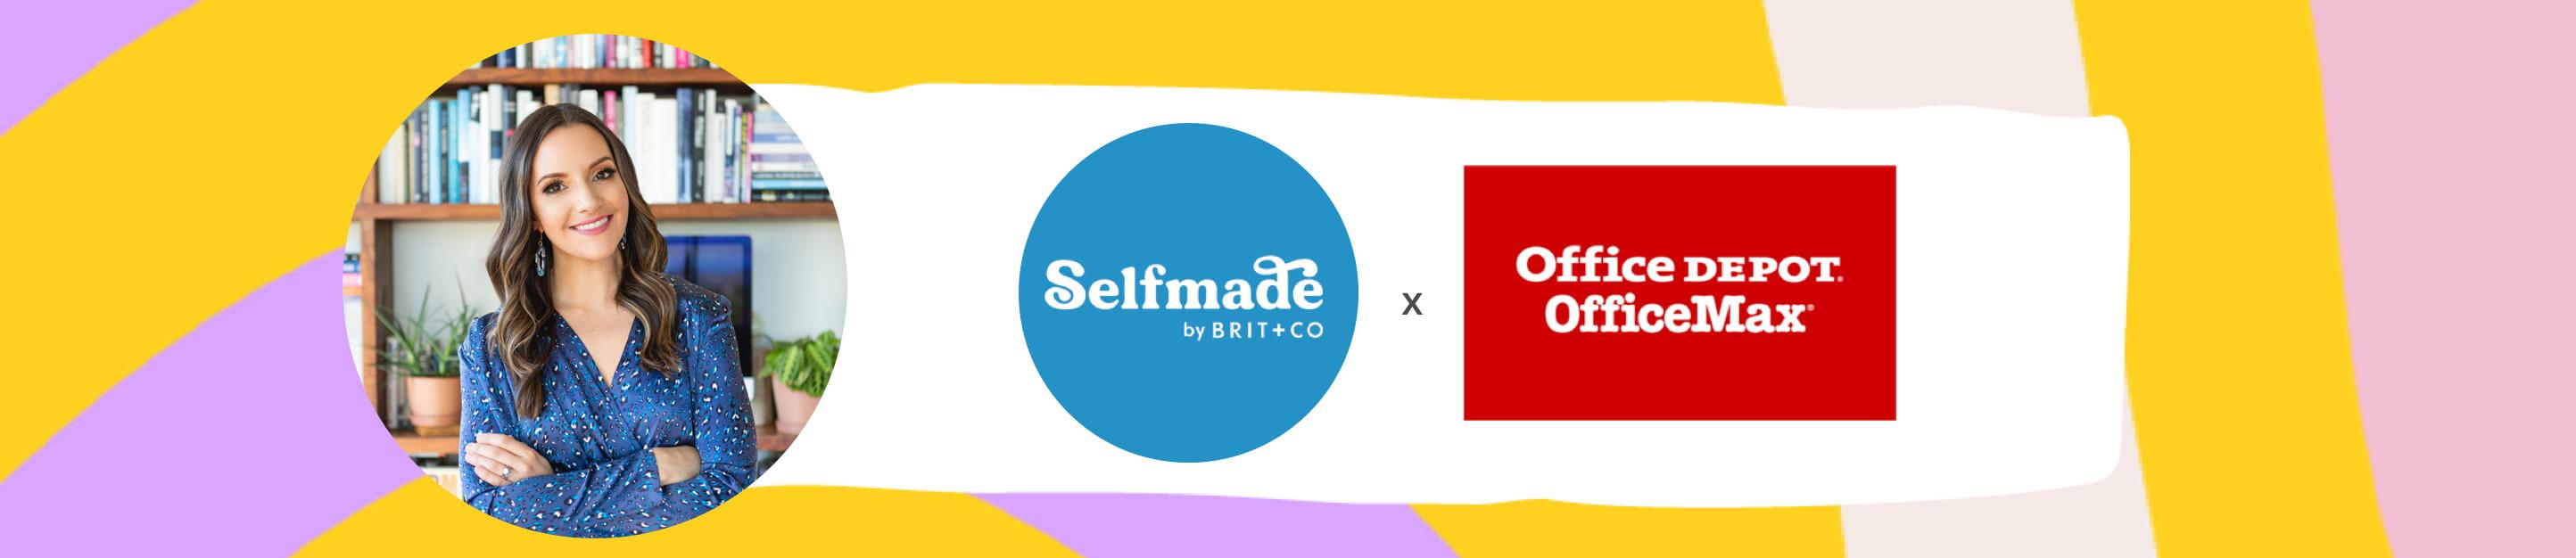 www_selfmade_britco_header